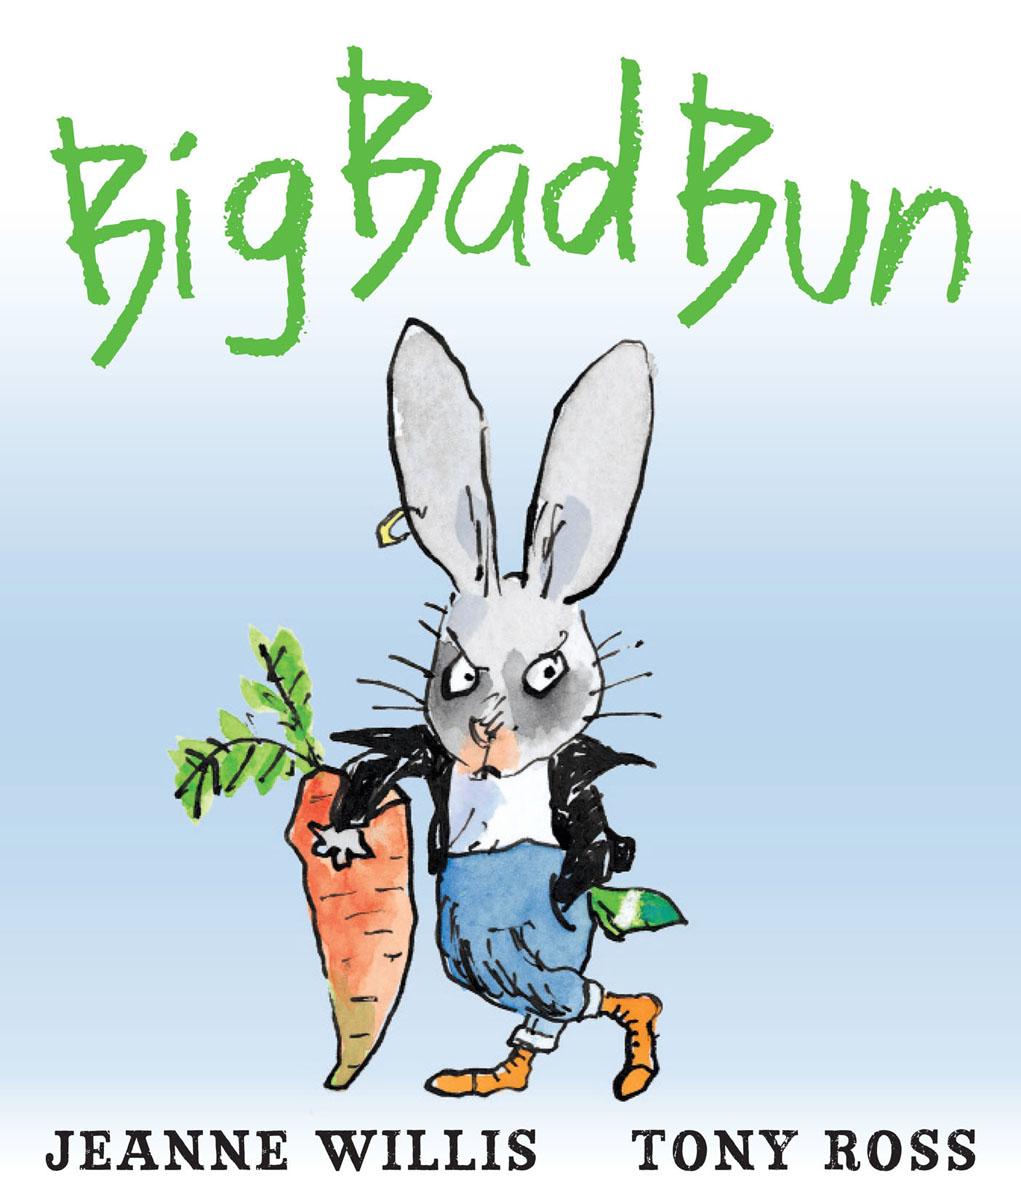 Big Bad Bun after i left you